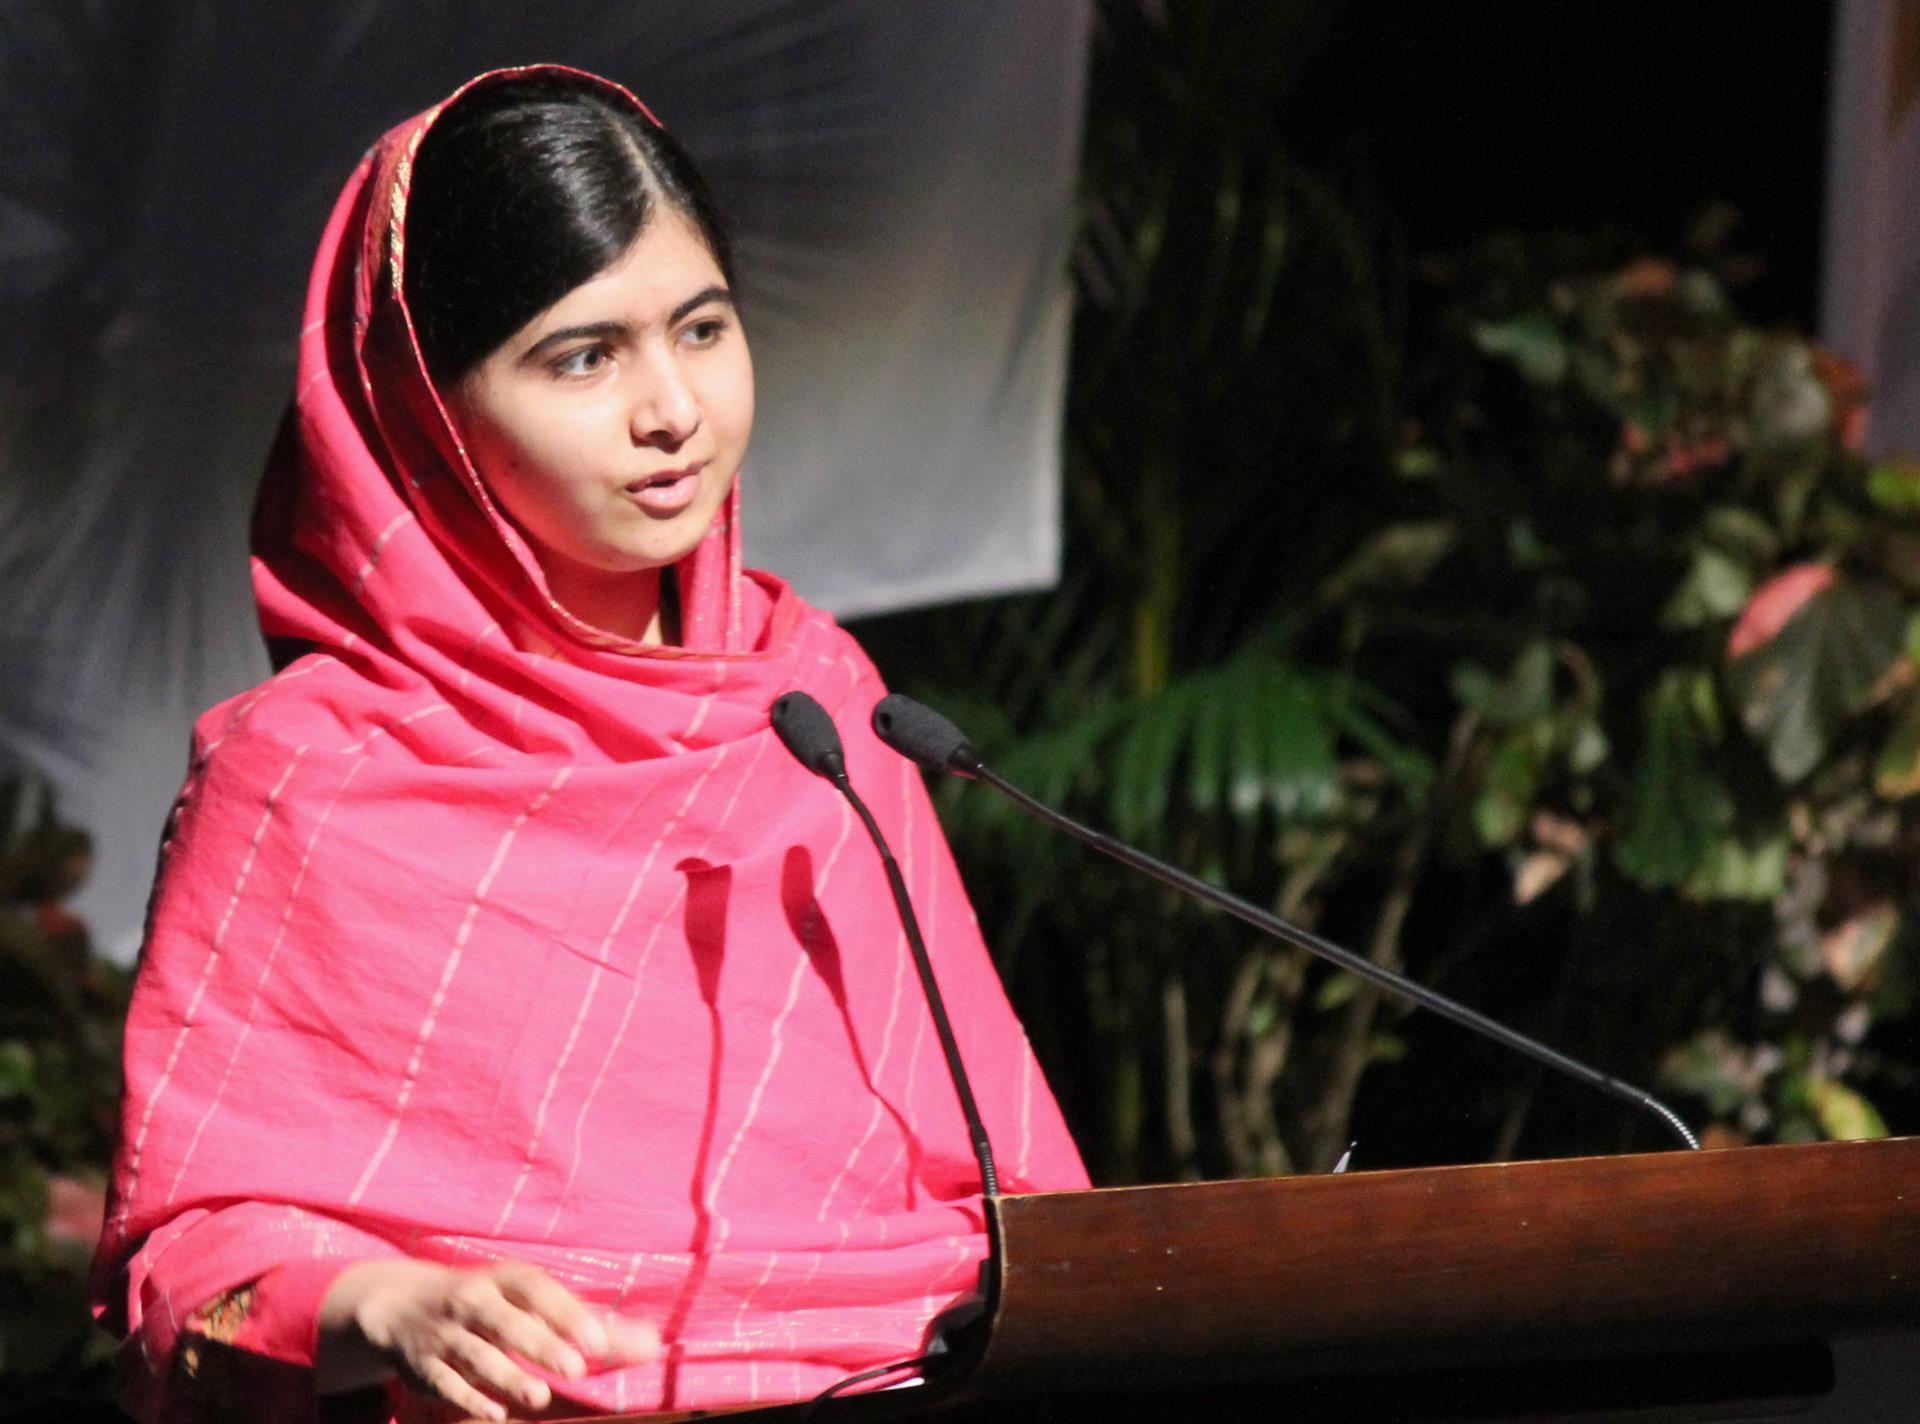 Malala Yousafzai Wallpaper 4   1920 X 1424 stmednet 1920x1424